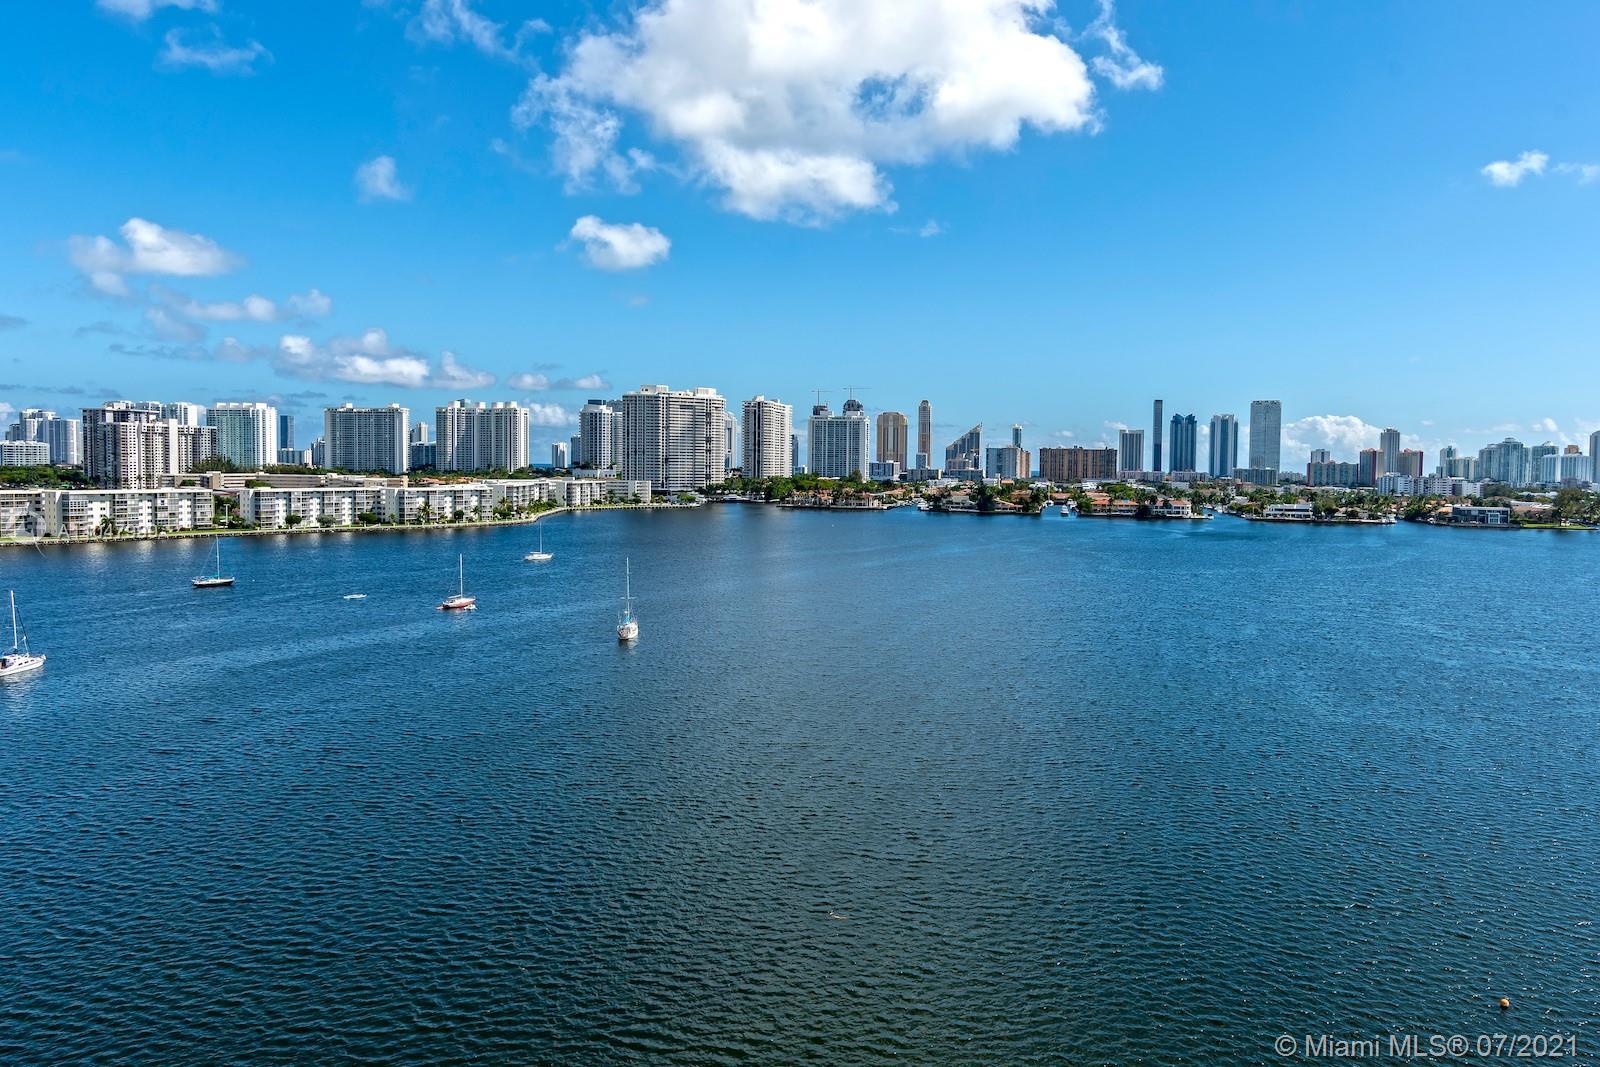 17301 Biscayne Blvd Unit 1009, North Miami Beach, Florida 33160